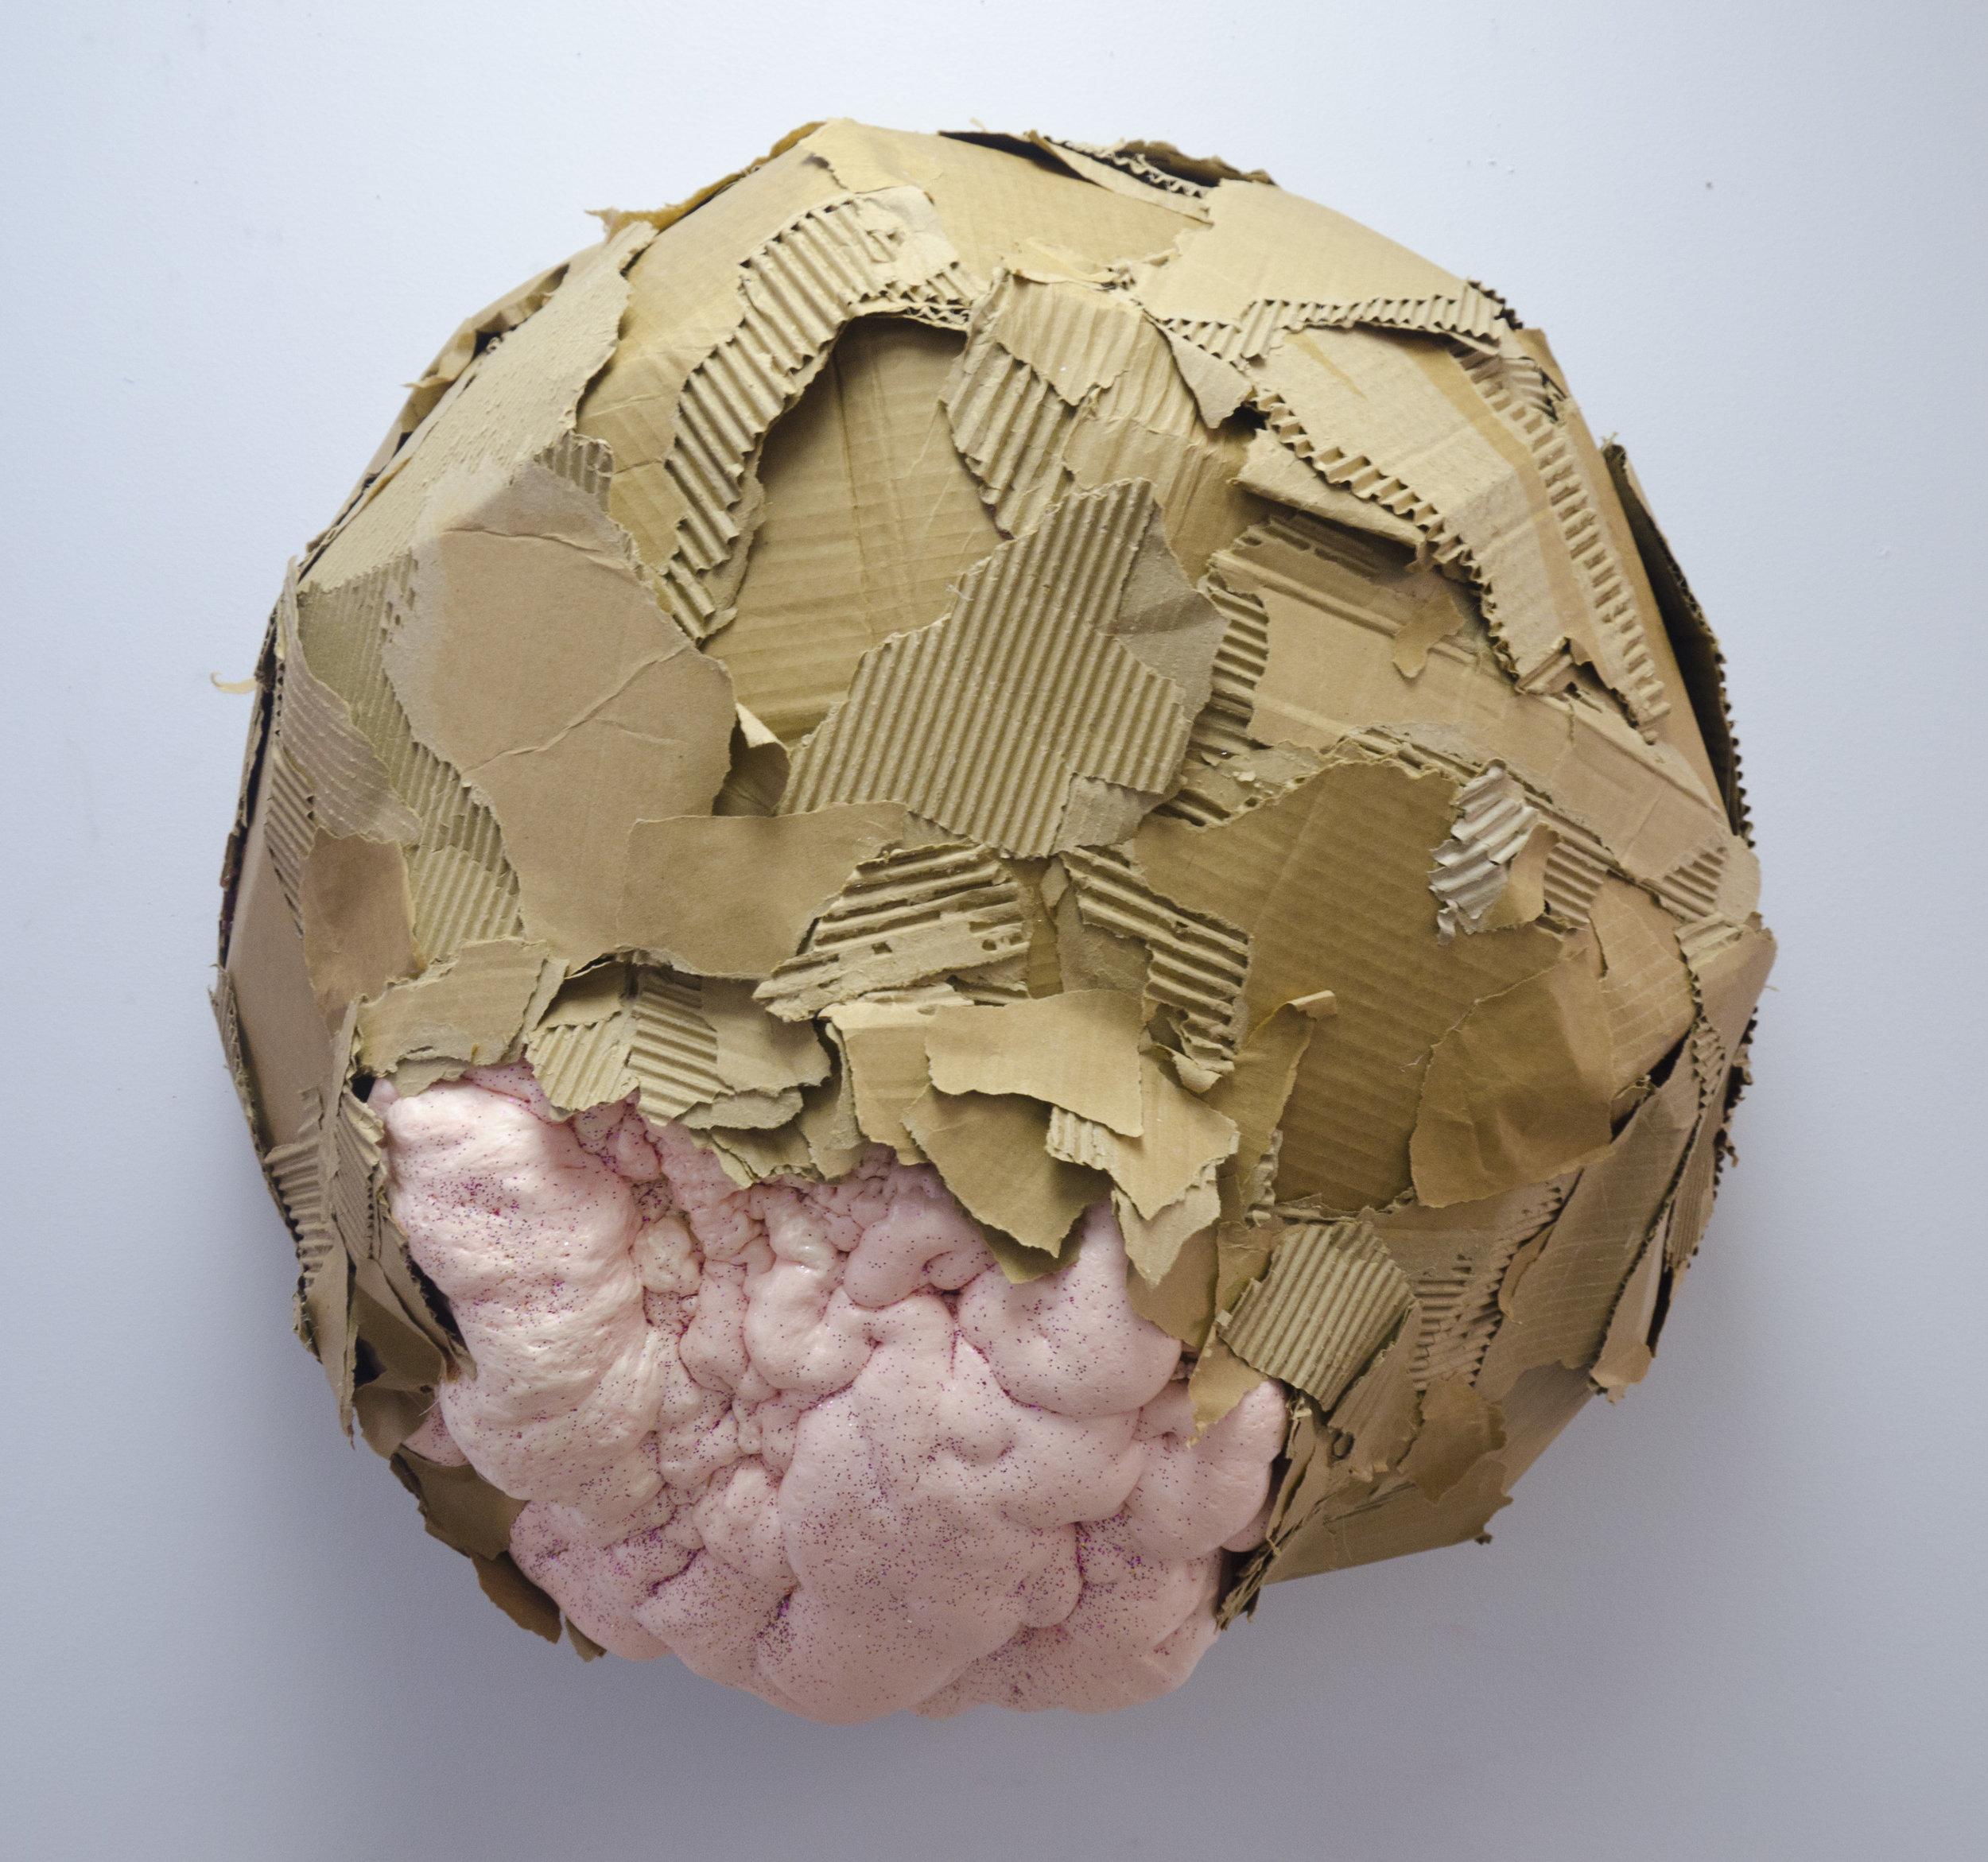 Bust    Cardboard, foam, acrylic, and glitter  2017